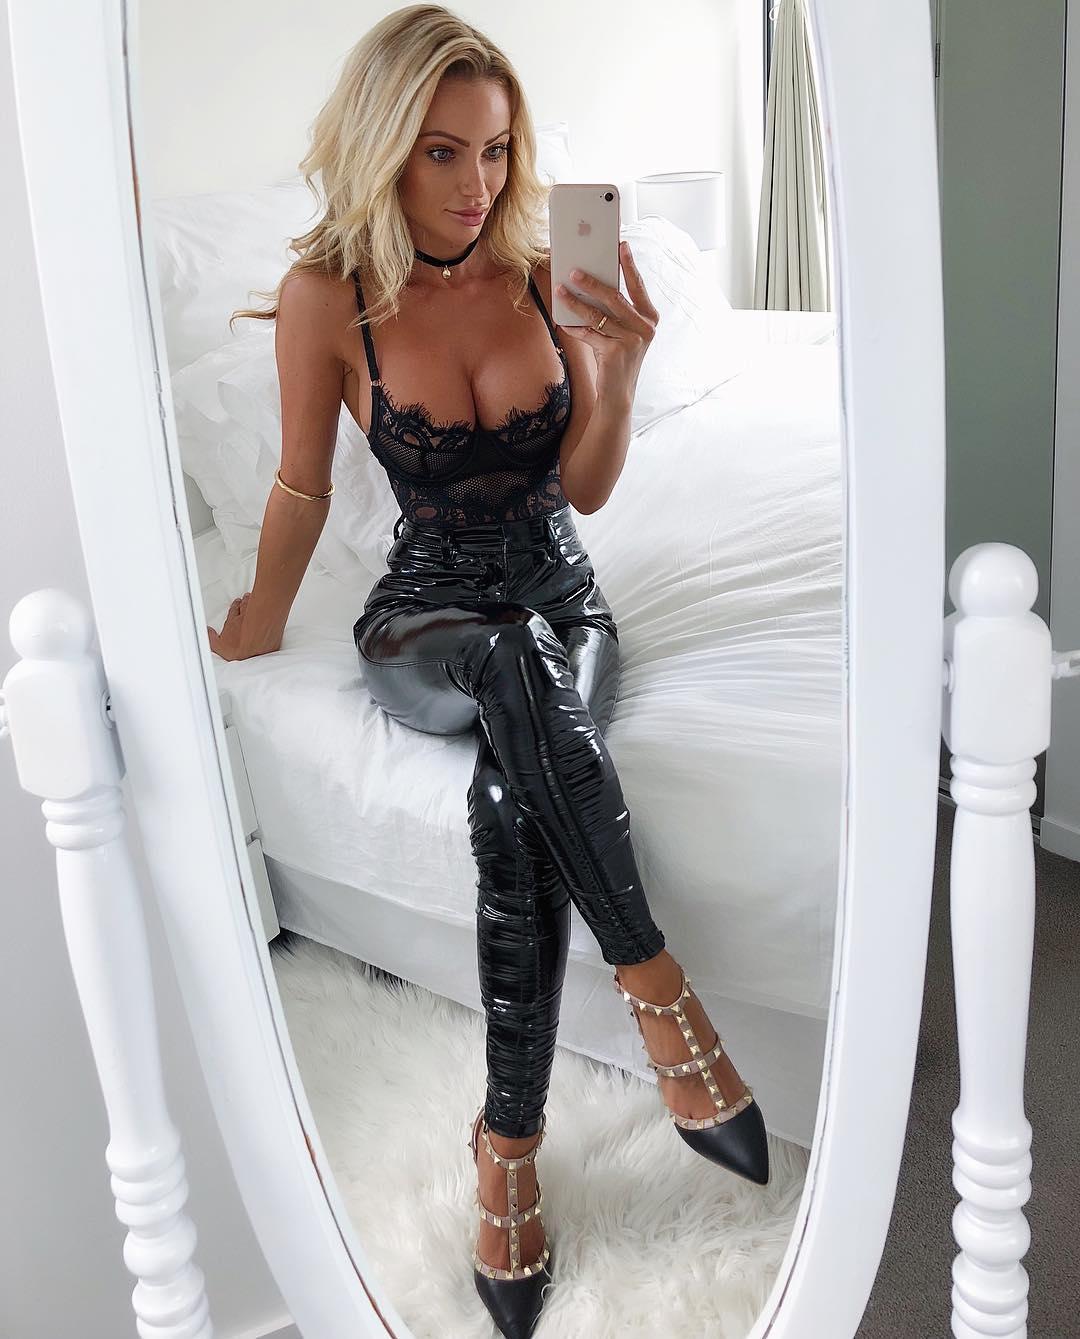 Abby Dowse nudes (57 pics), fotos Feet, Instagram, butt 2018